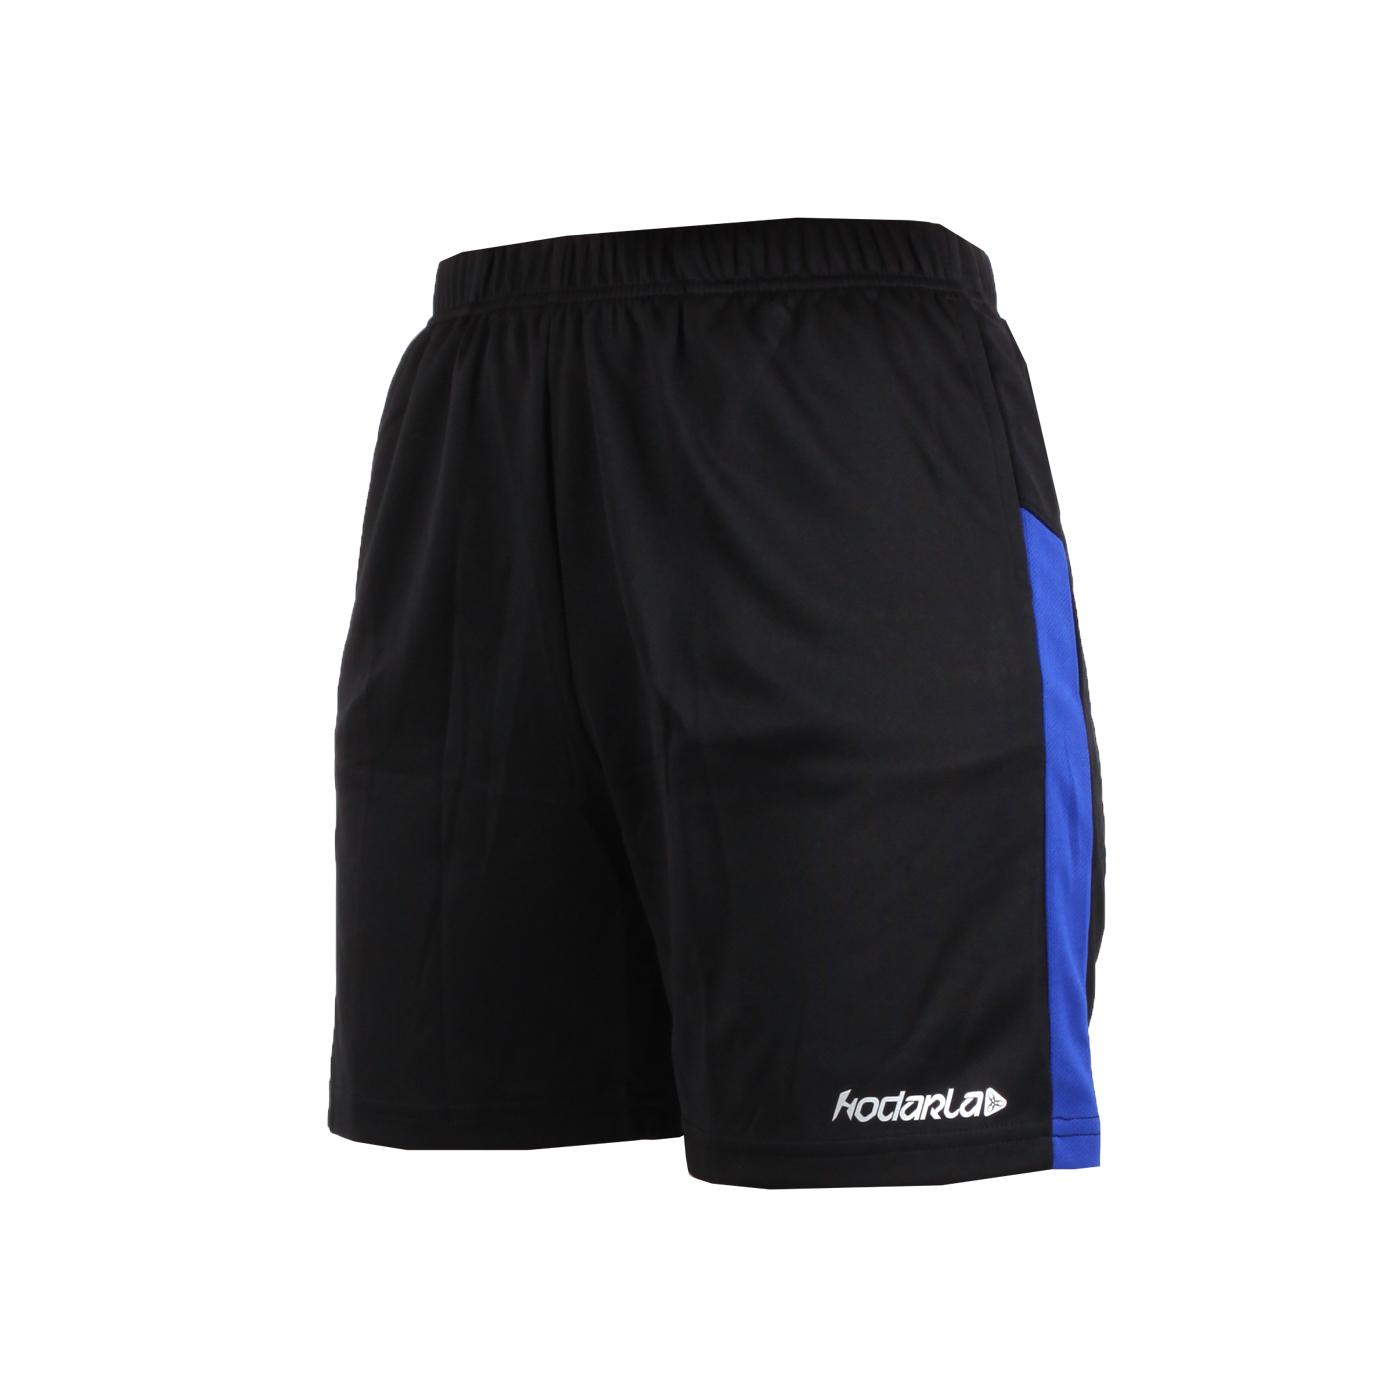 HODARLA 童-奔馳吸濕排汗運動短褲 3144601 - 黑藍